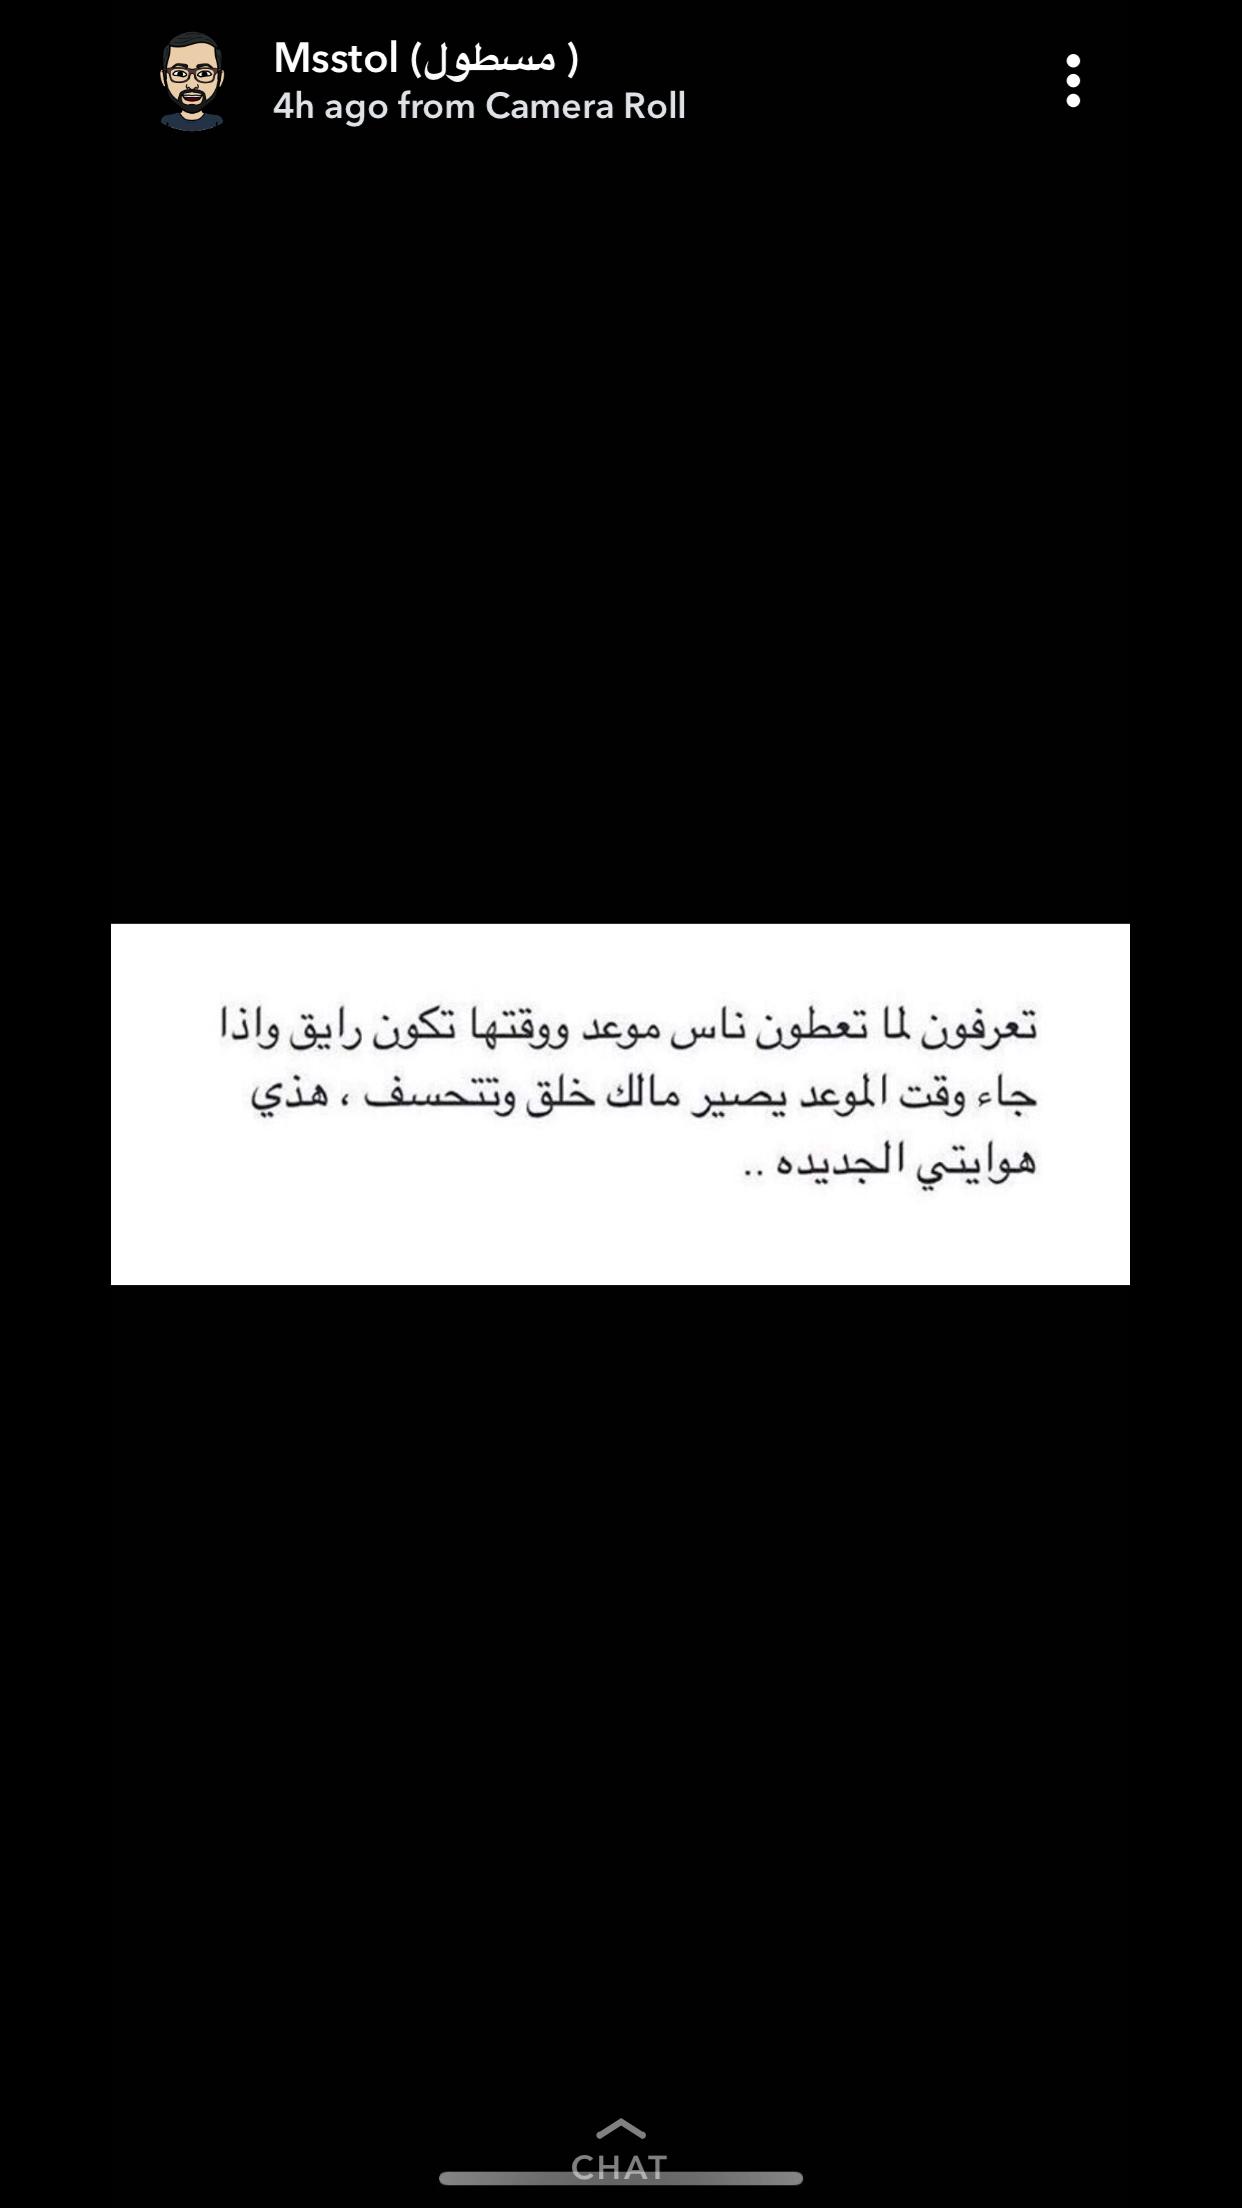 Pin by Joumana on Lol Arabic funny, Arabic memes, Funny